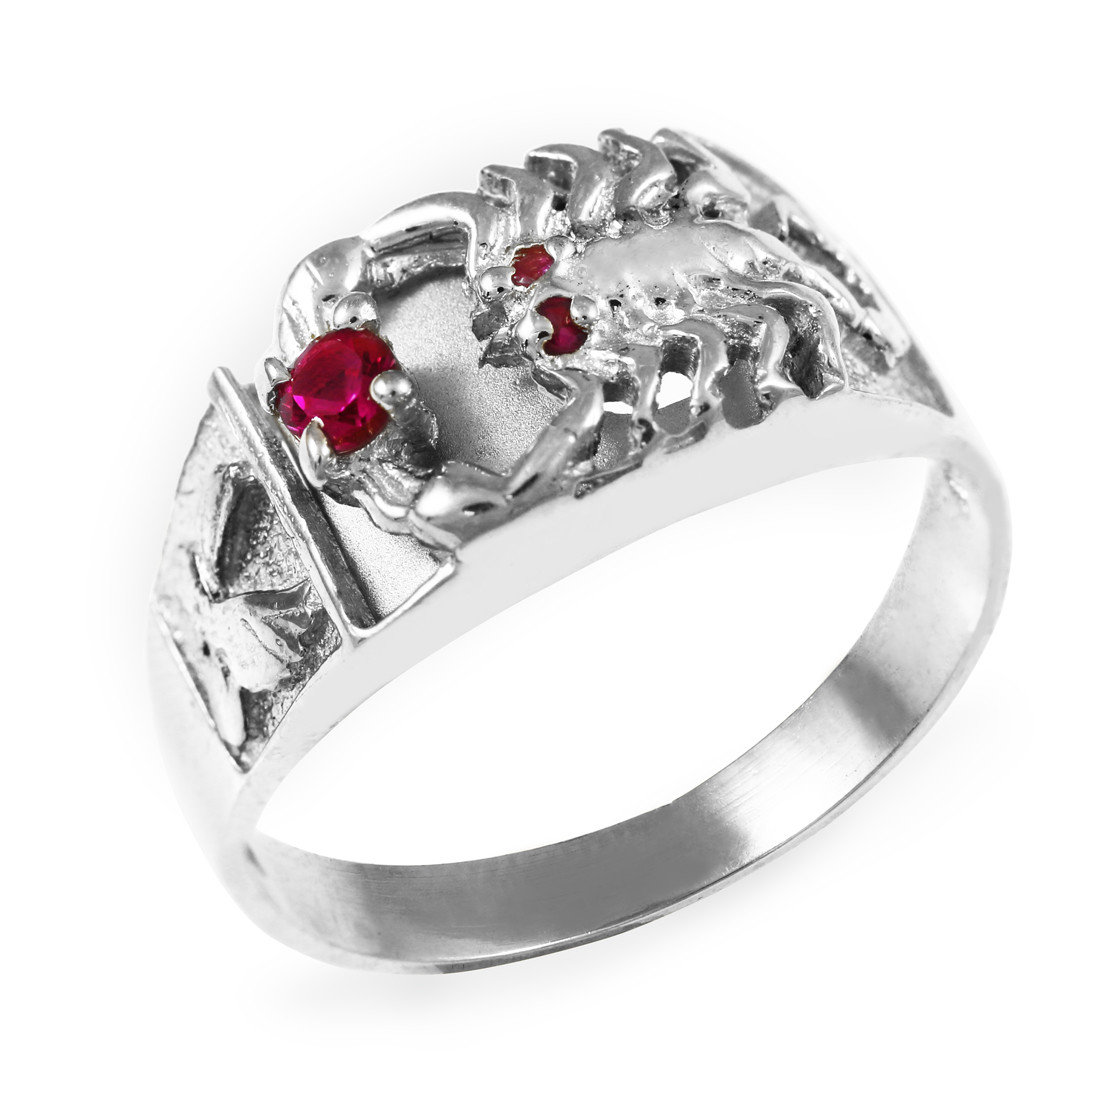 LAST ONE Topaz Necklace Scorpio Necklace Necklace Zodiac |Scorpio Gemstone Rings